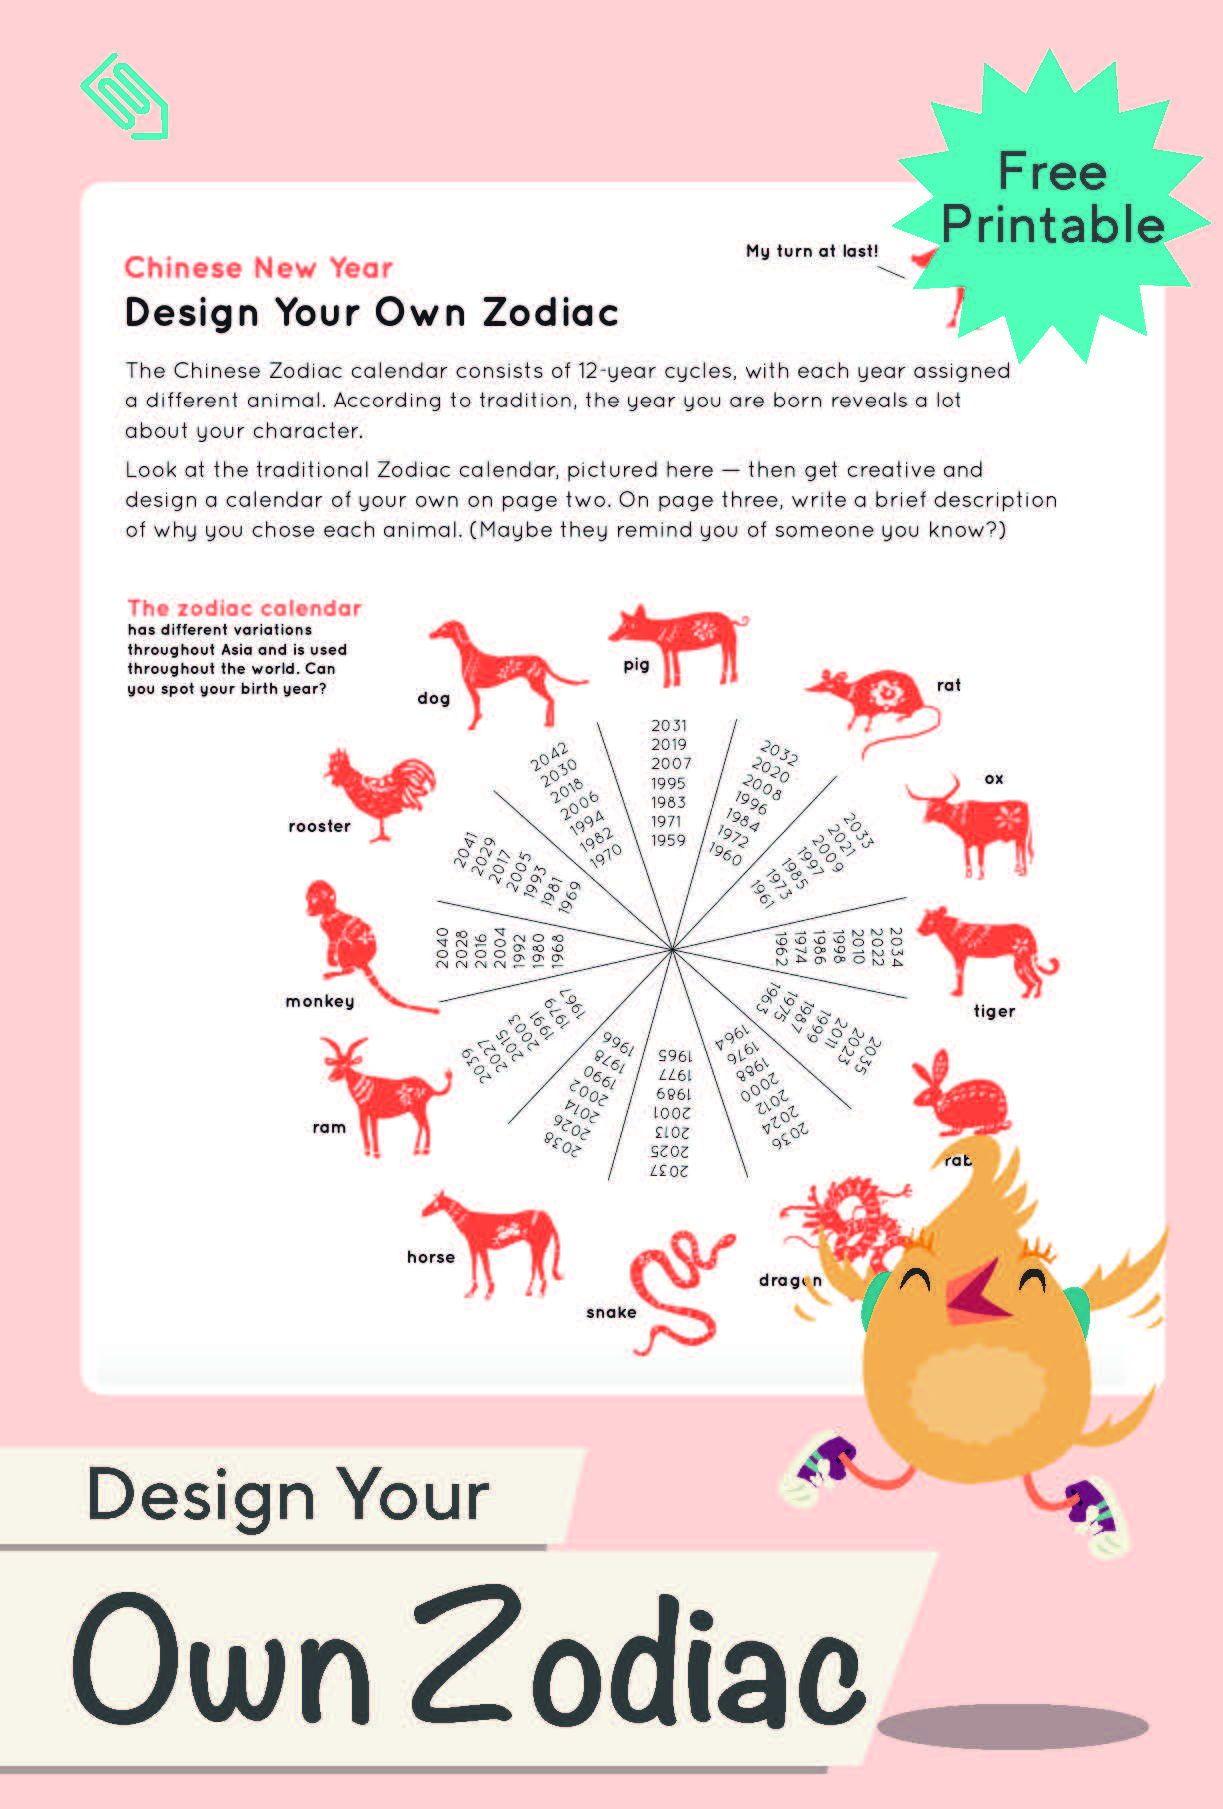 Design Your Own Zodiac